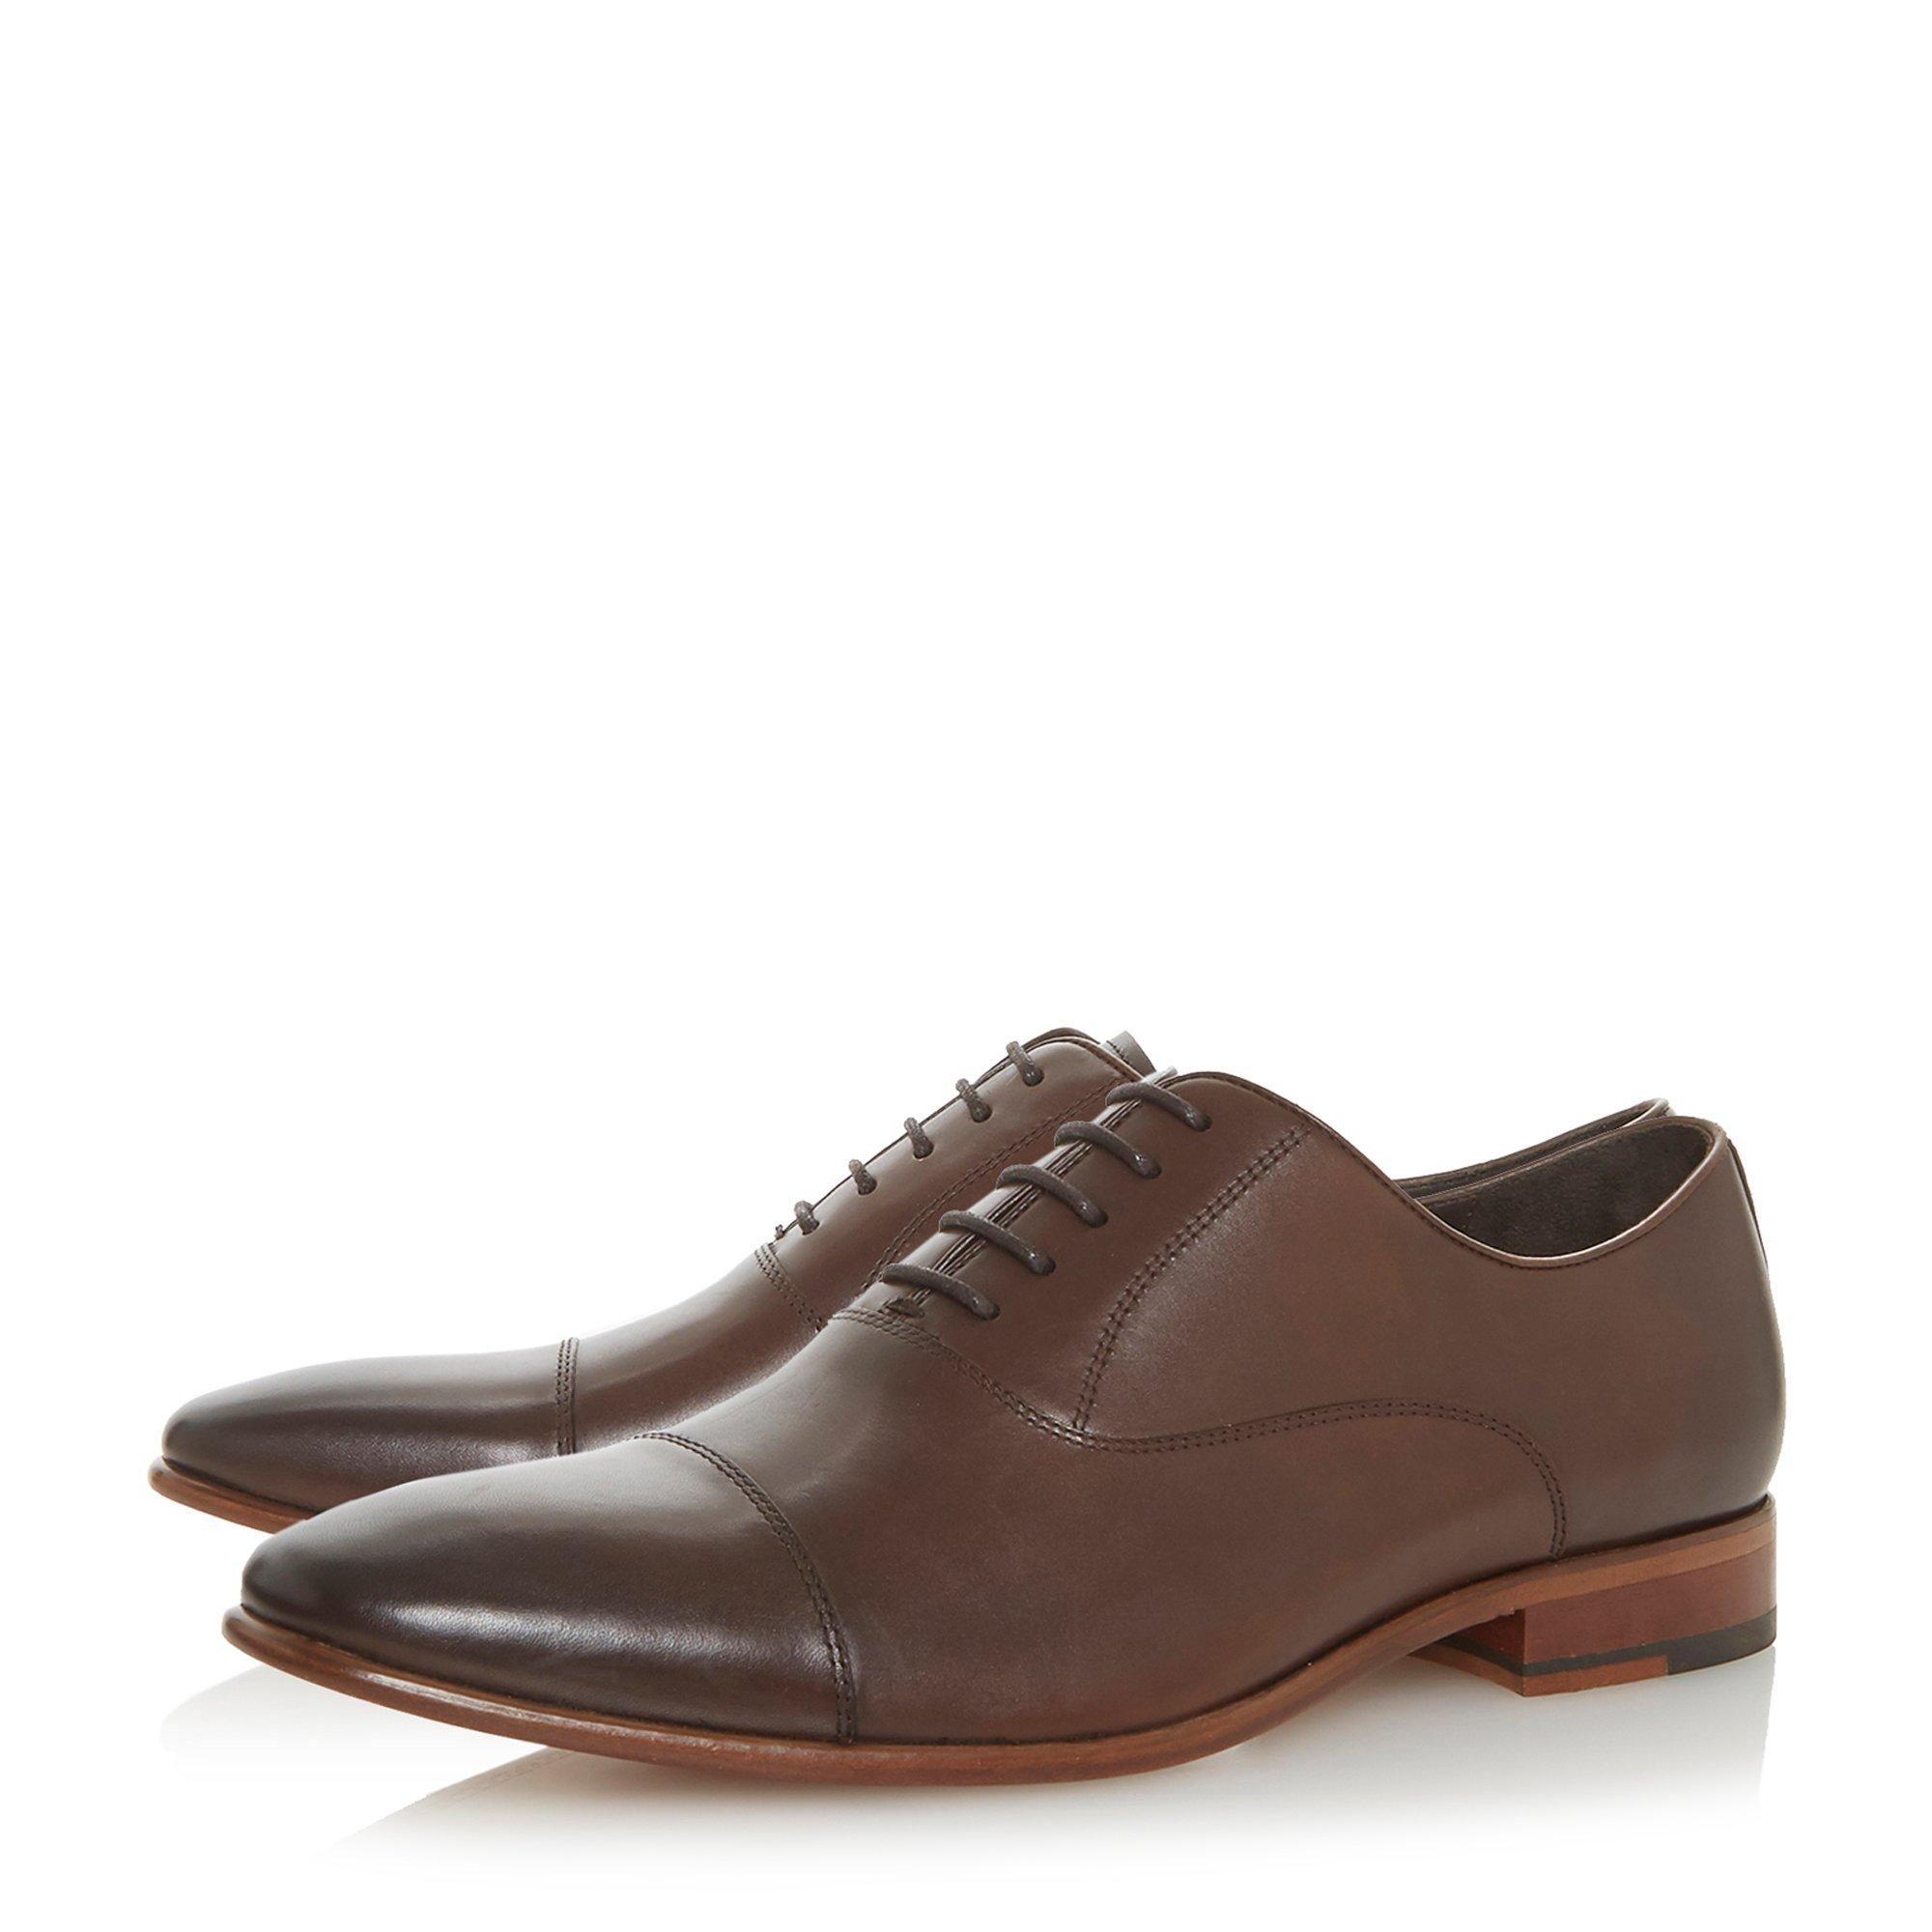 Dune Mens PONTUS Leather Smart Oxford Shoes